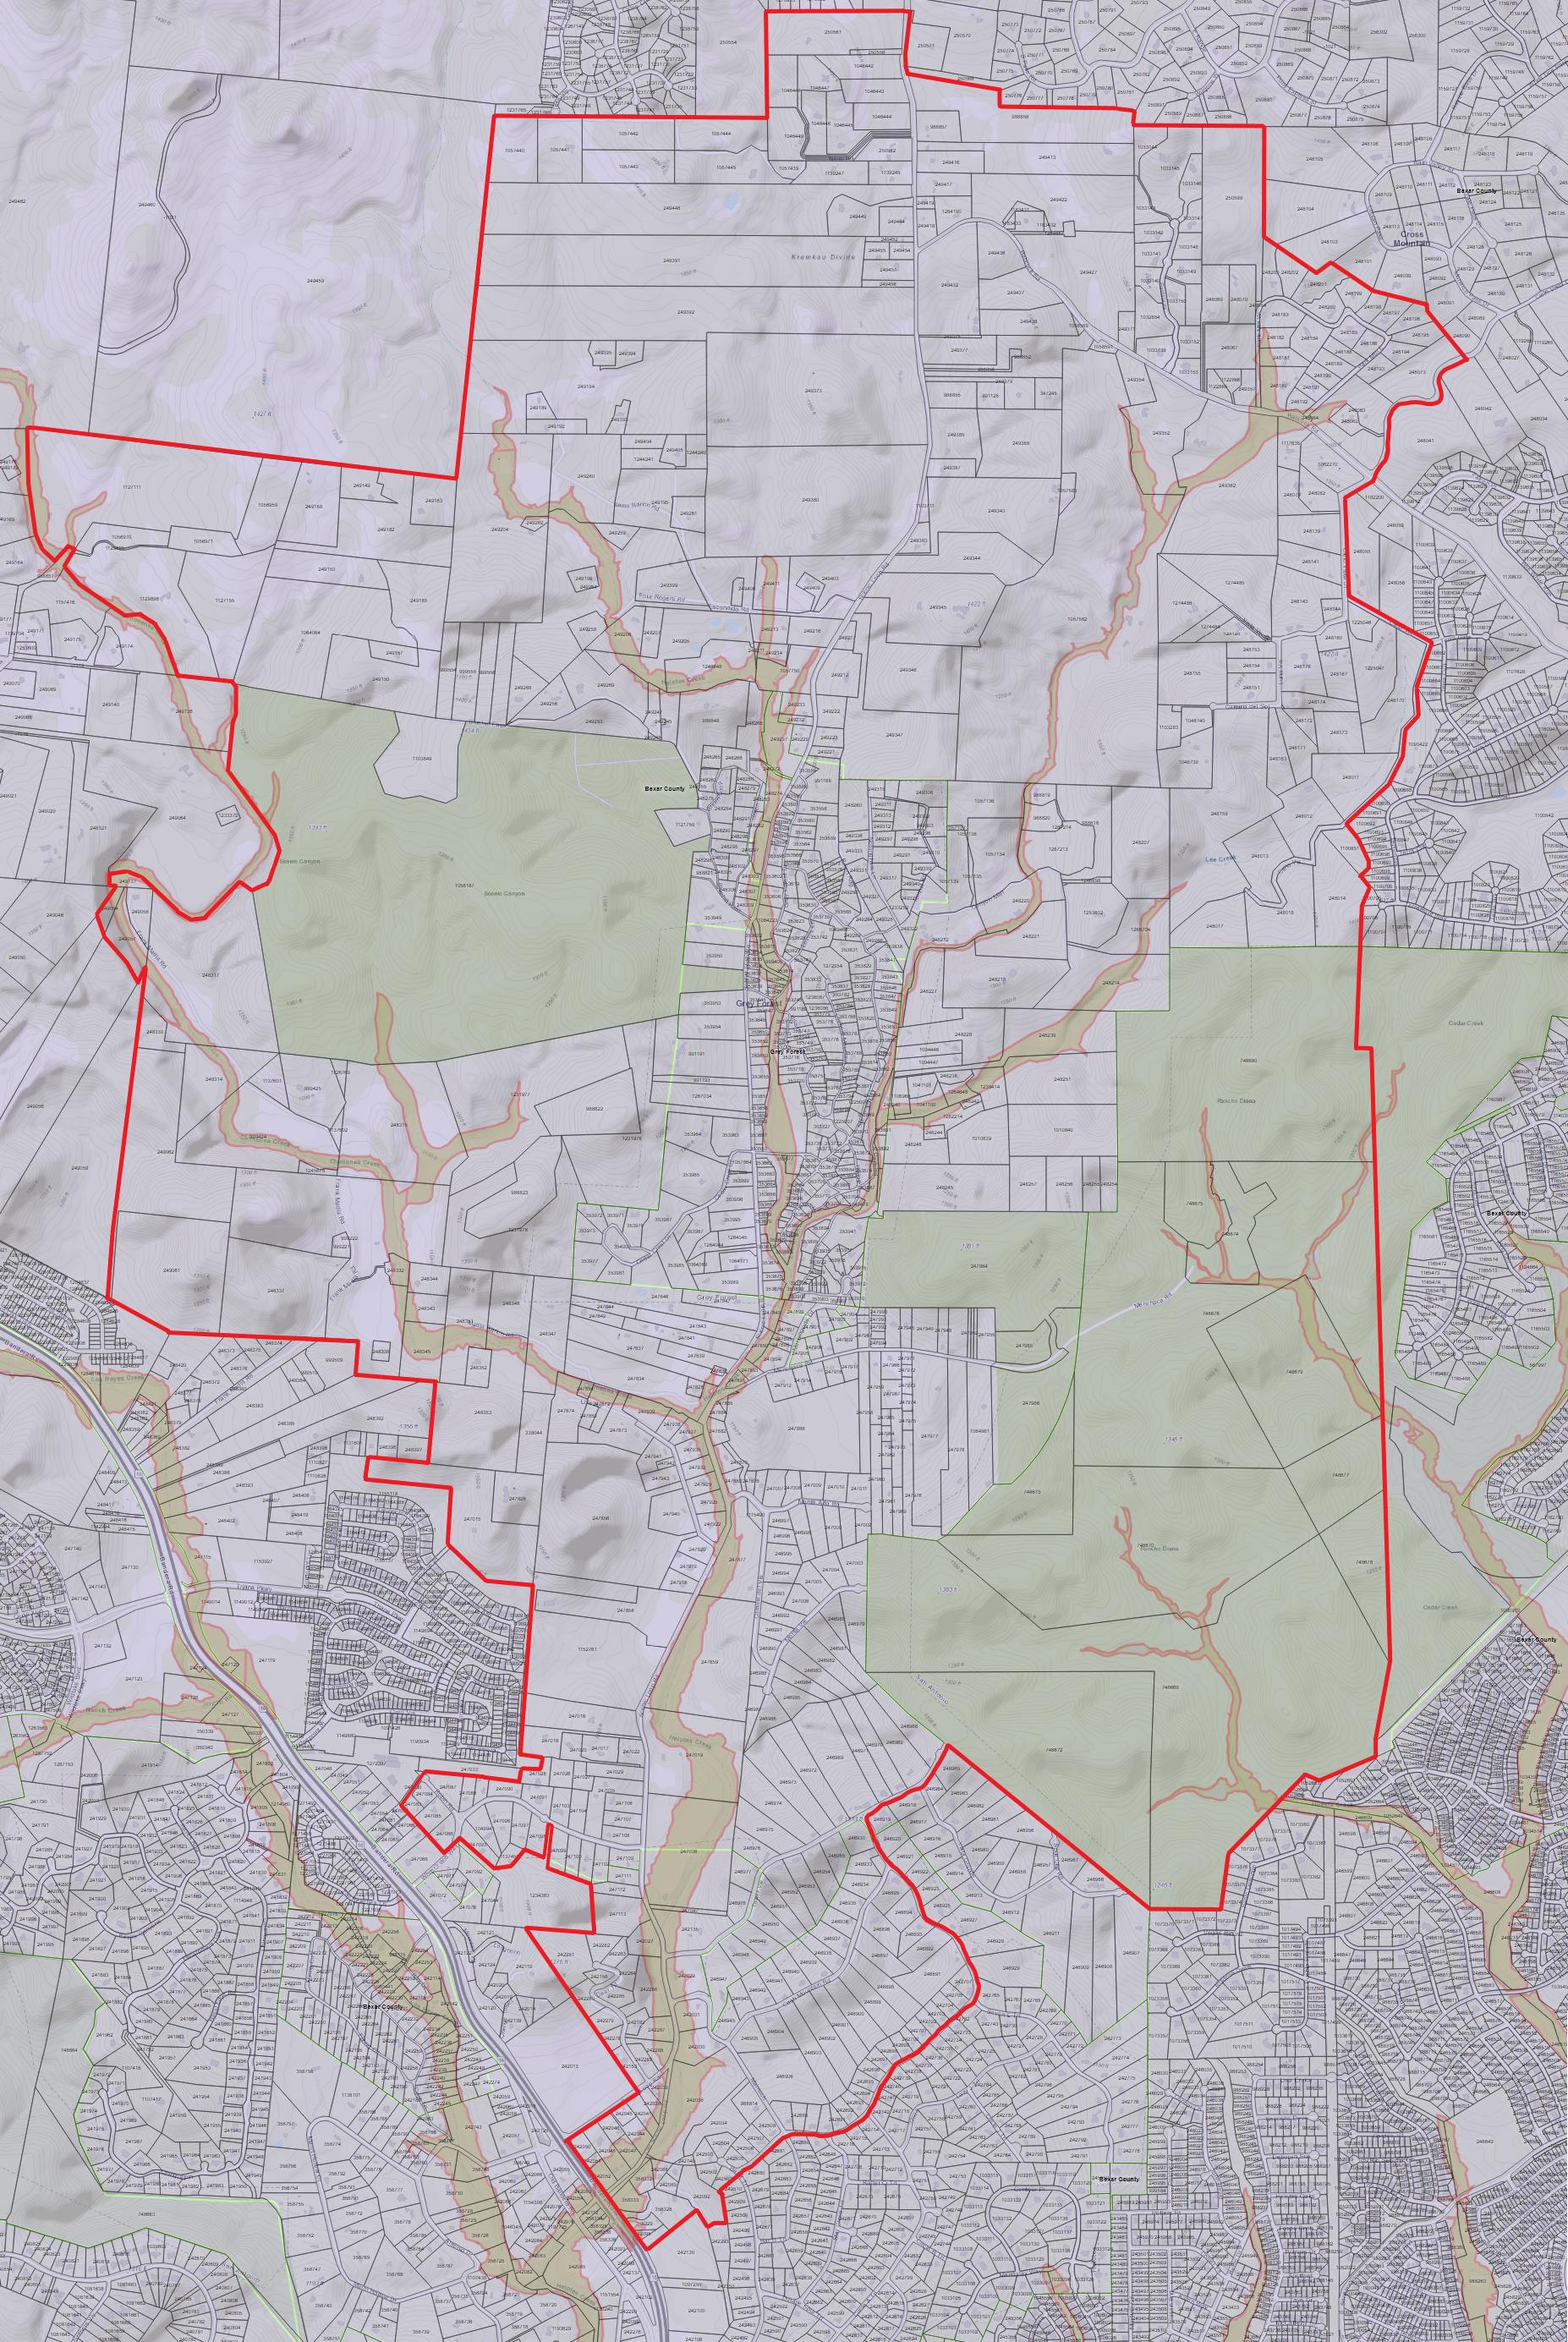 Scenic Loop - Helotes Creek Alliance Neighborhood map with Waterways